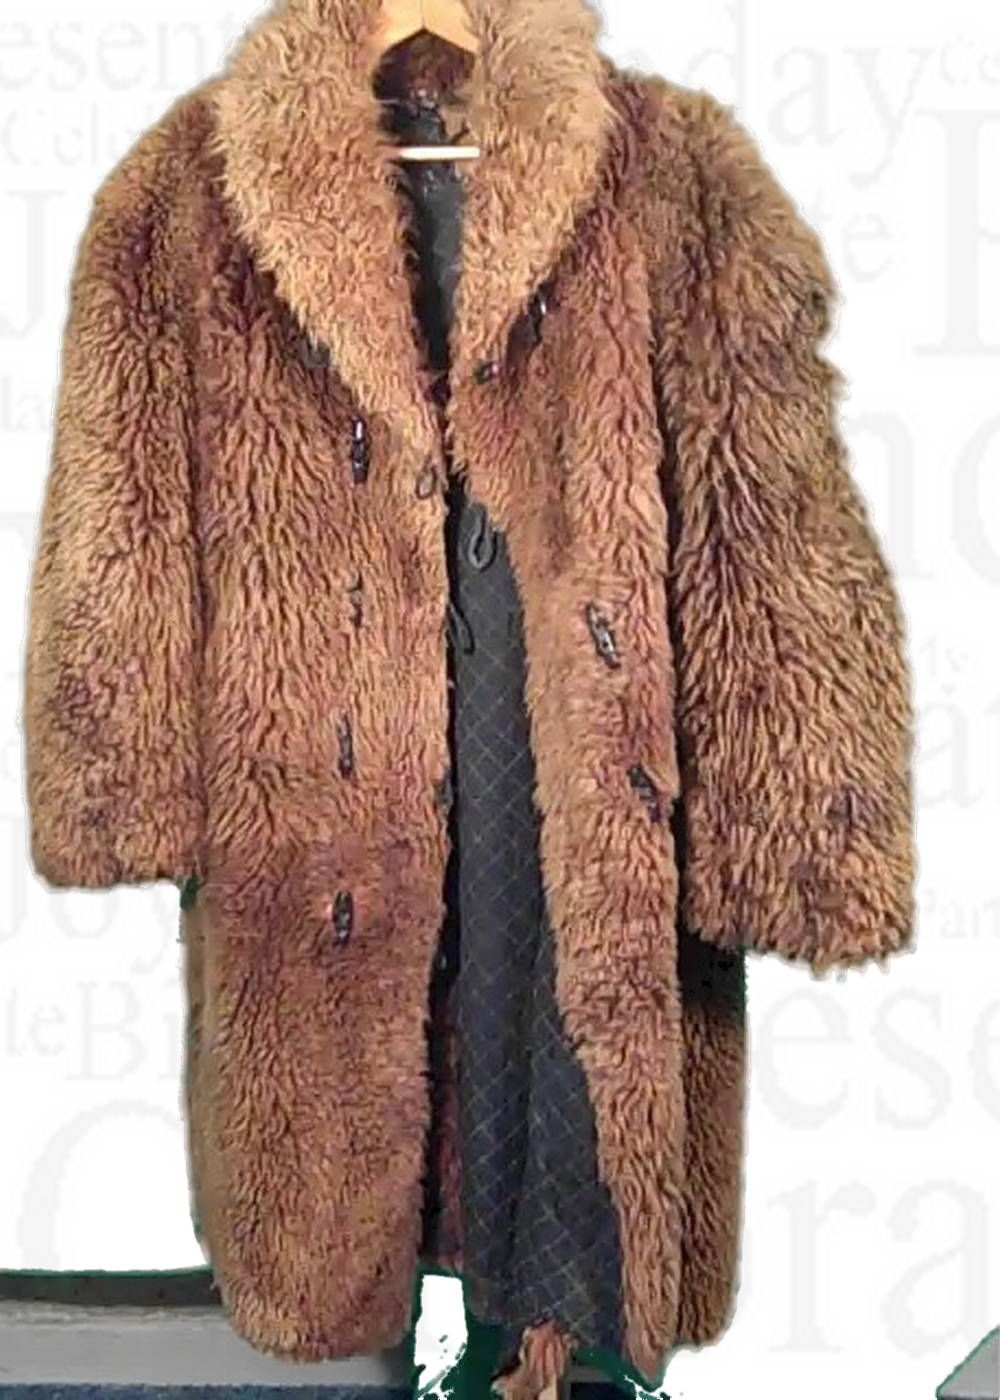 Buffalo Coat Circa 1890 Authentic Buffalo Coat For